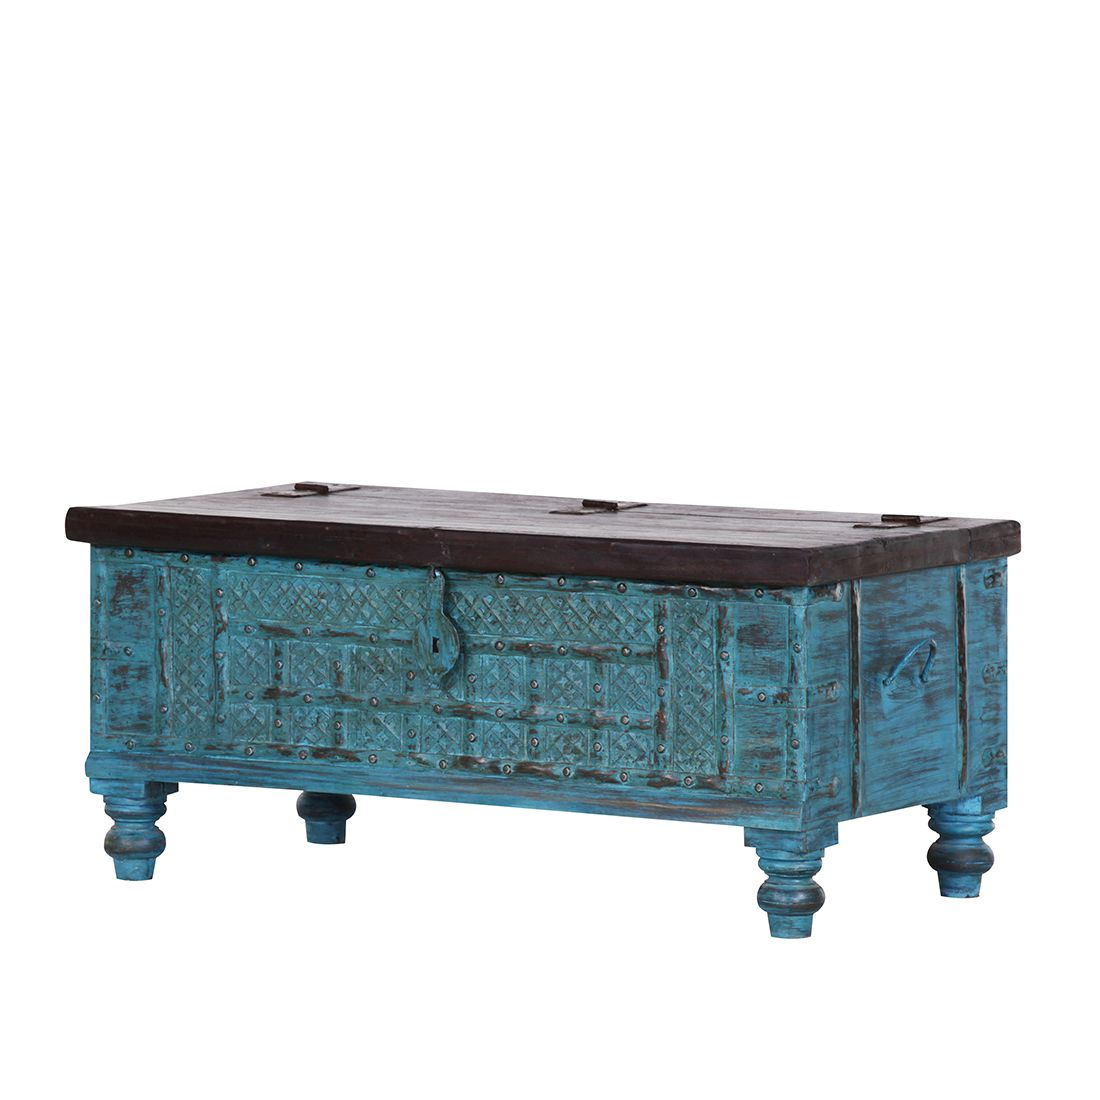 truhe watergate mango massiv recycled altholz t rkis blau red living online kaufen bei woonio. Black Bedroom Furniture Sets. Home Design Ideas